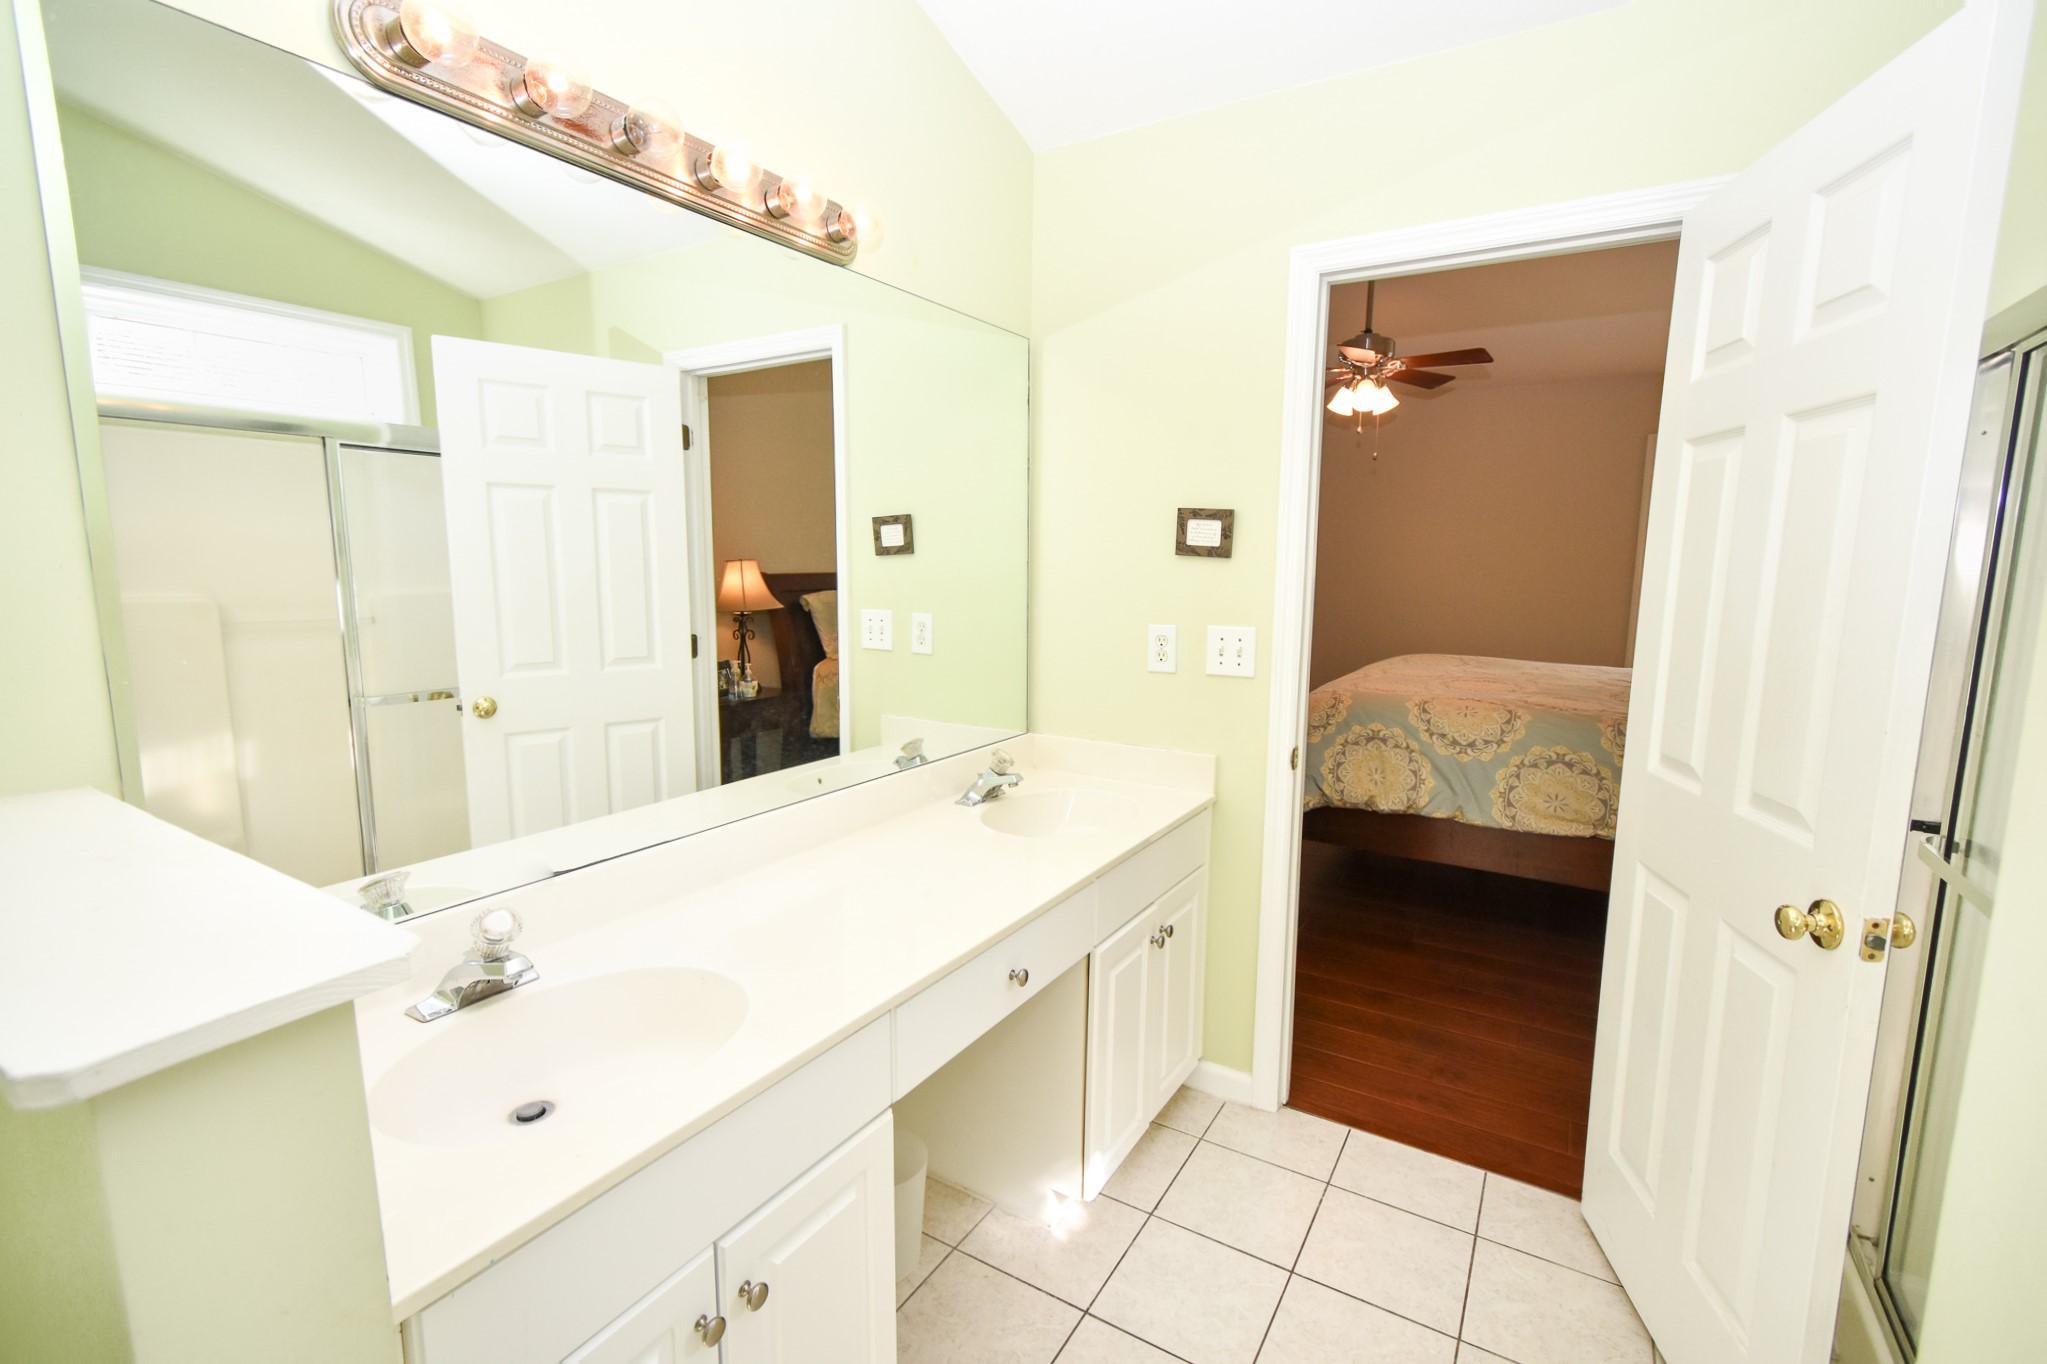 Park West Homes For Sale - 1444 Wellesley, Mount Pleasant, SC - 17